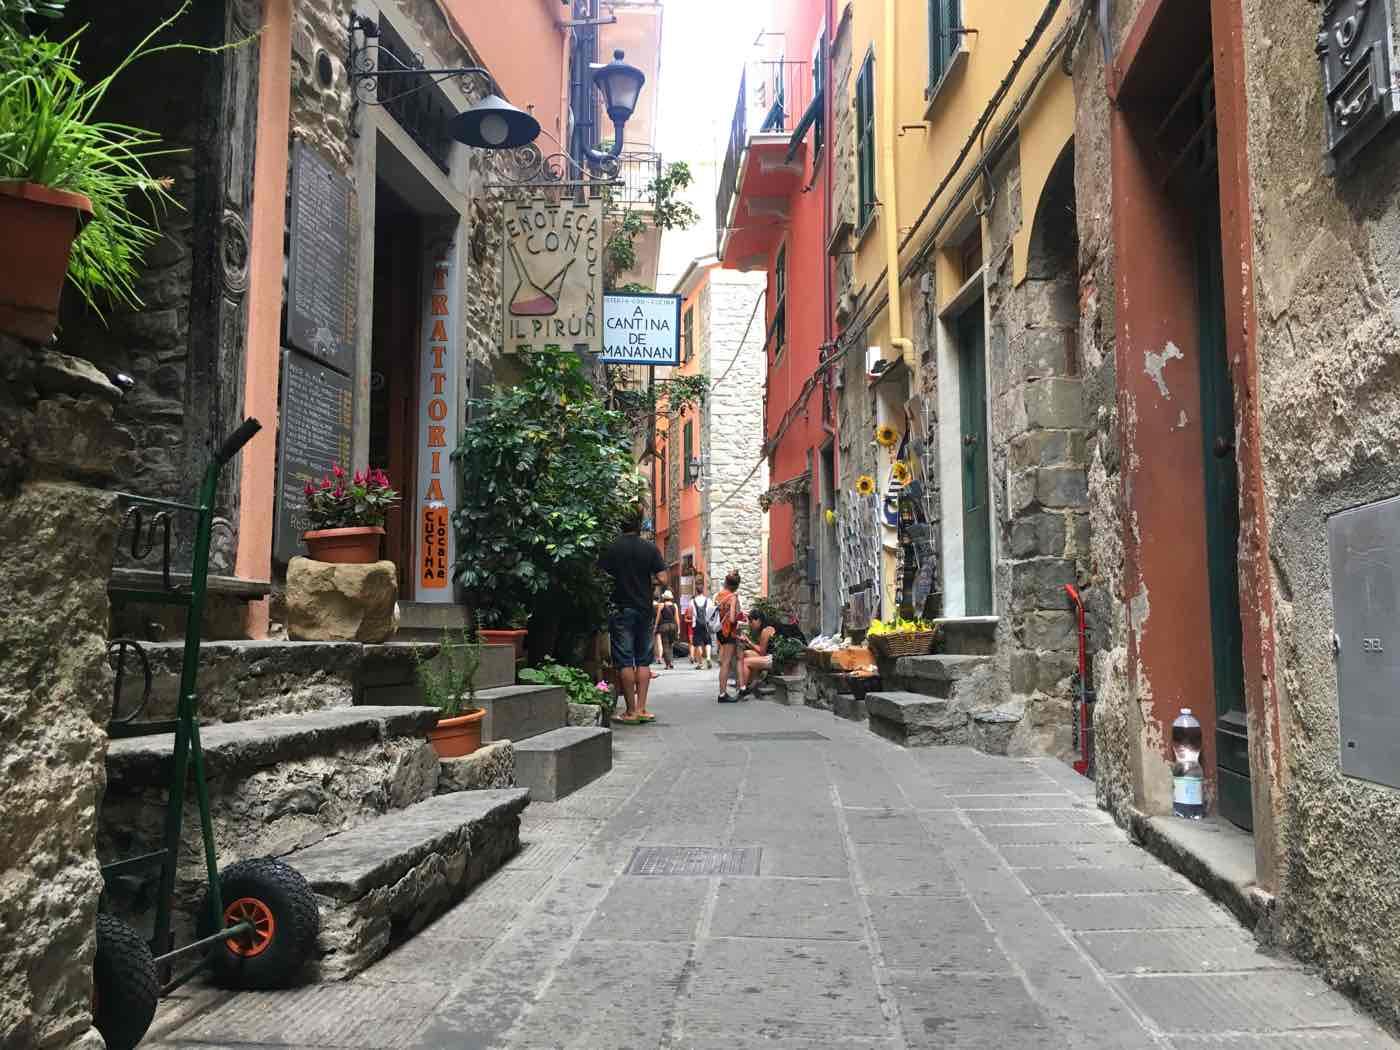 Corniglia Italy Food To Eat